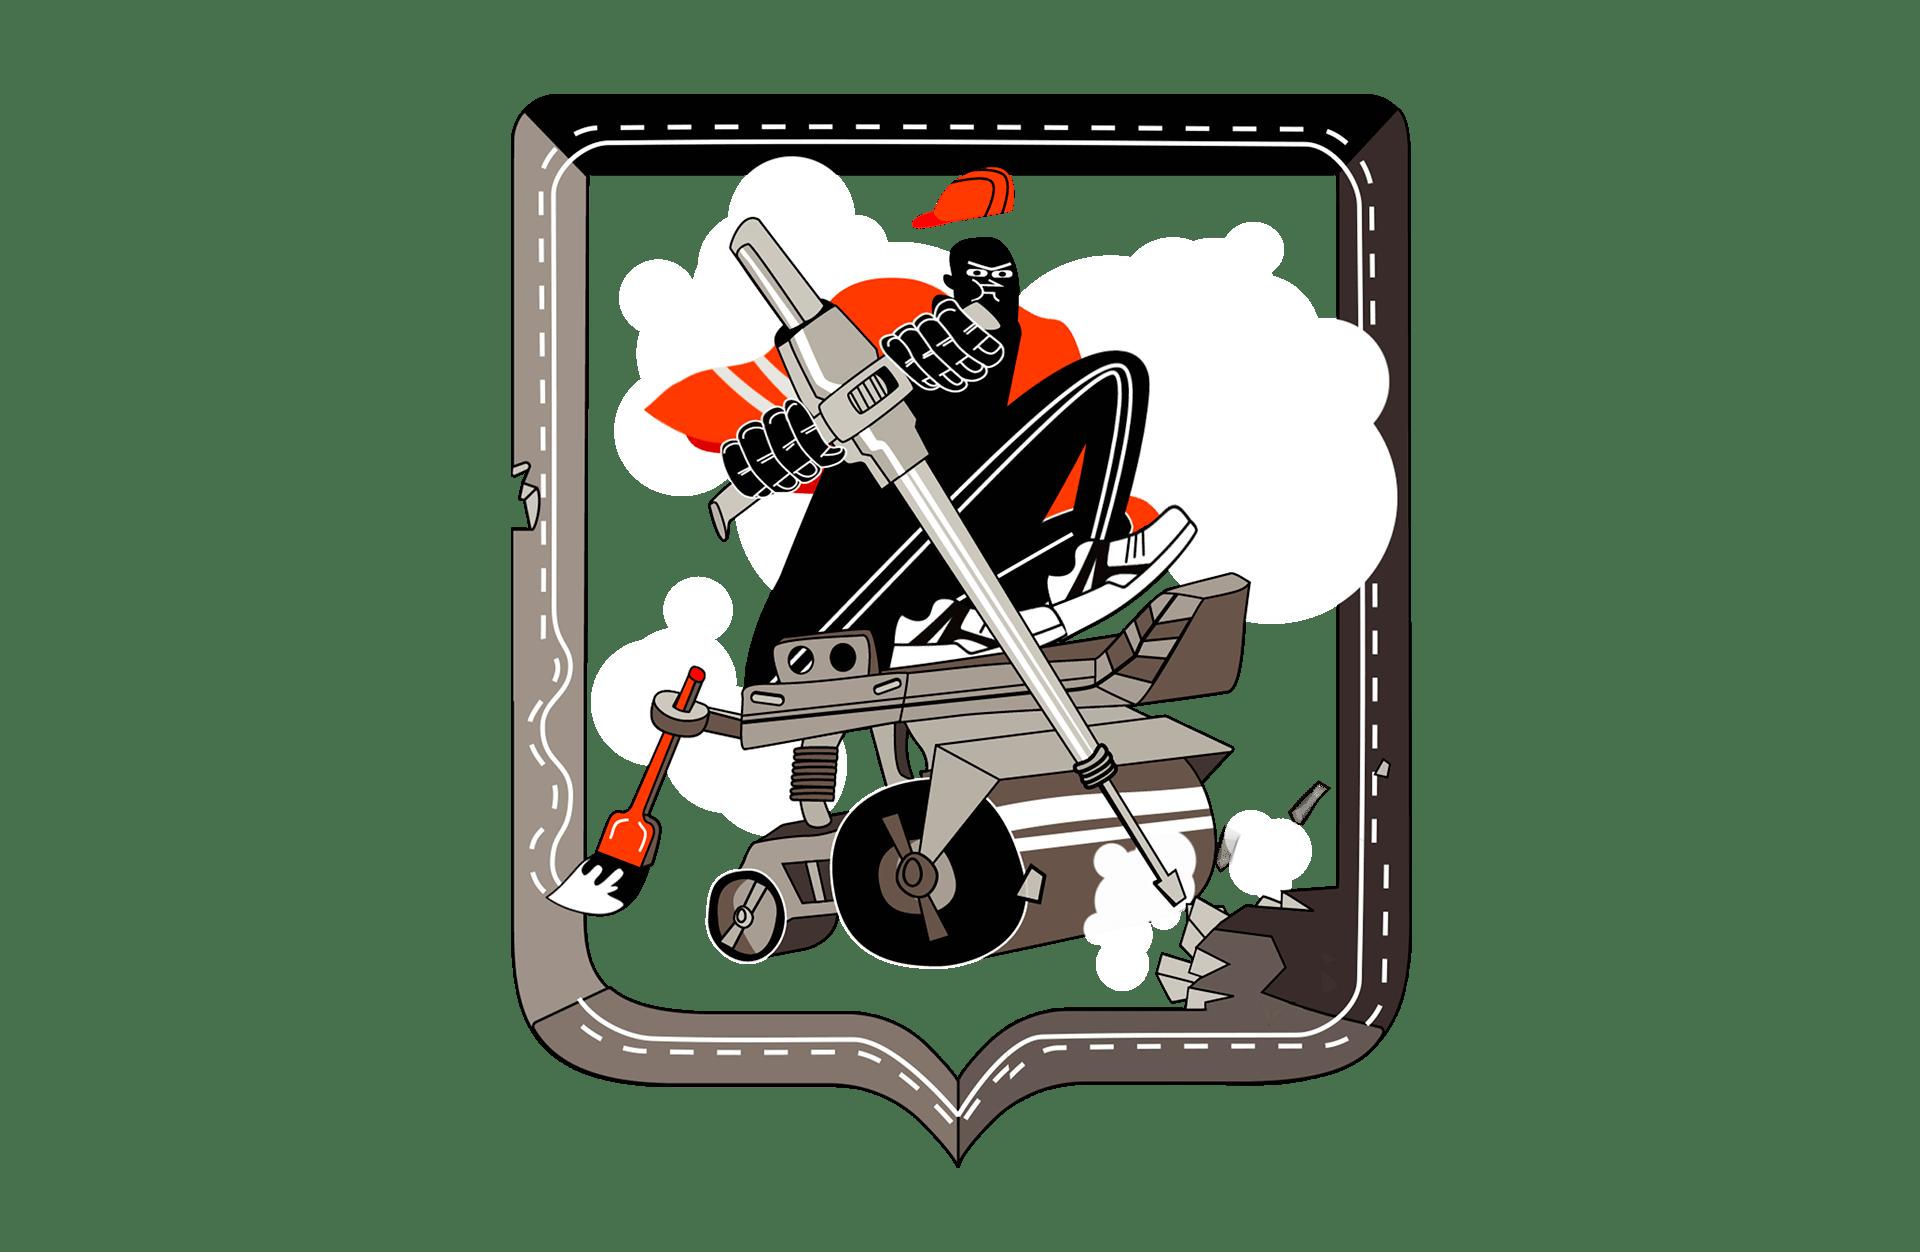 13 - Новый герб Москвы